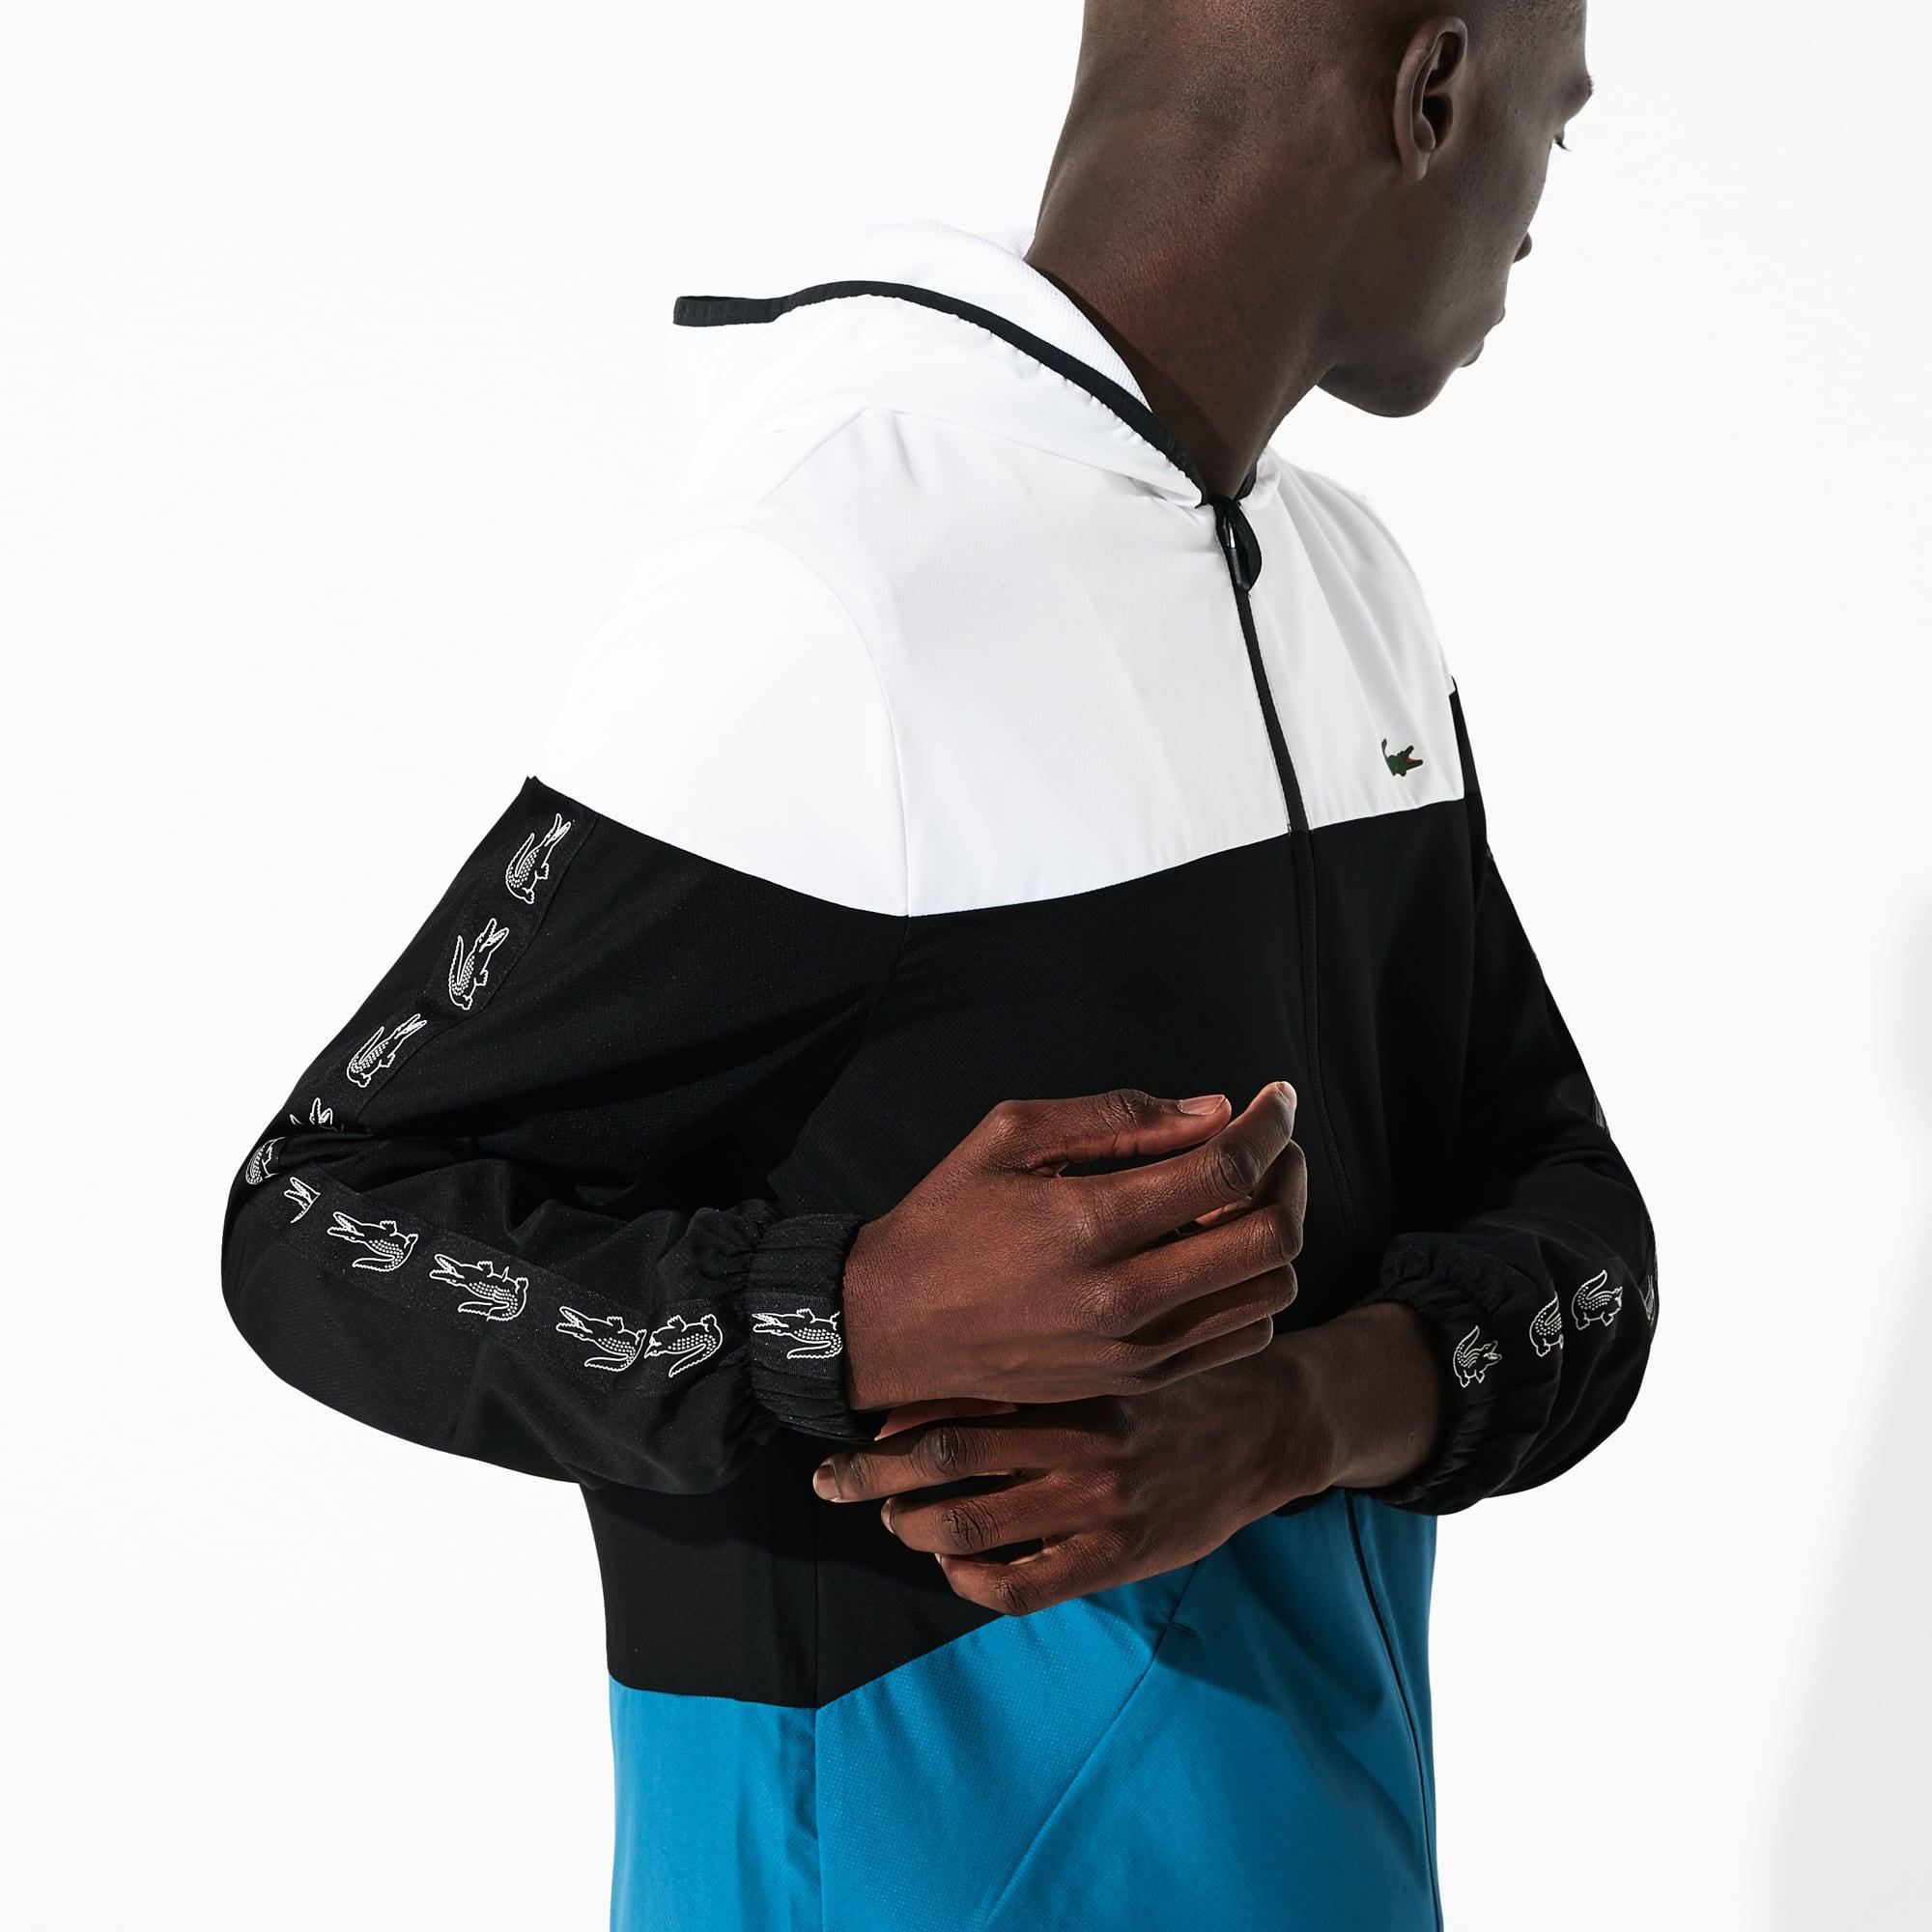 c936ed9e5 + 1 color. New. Men s SPORT Colorblock Tennis Jacket